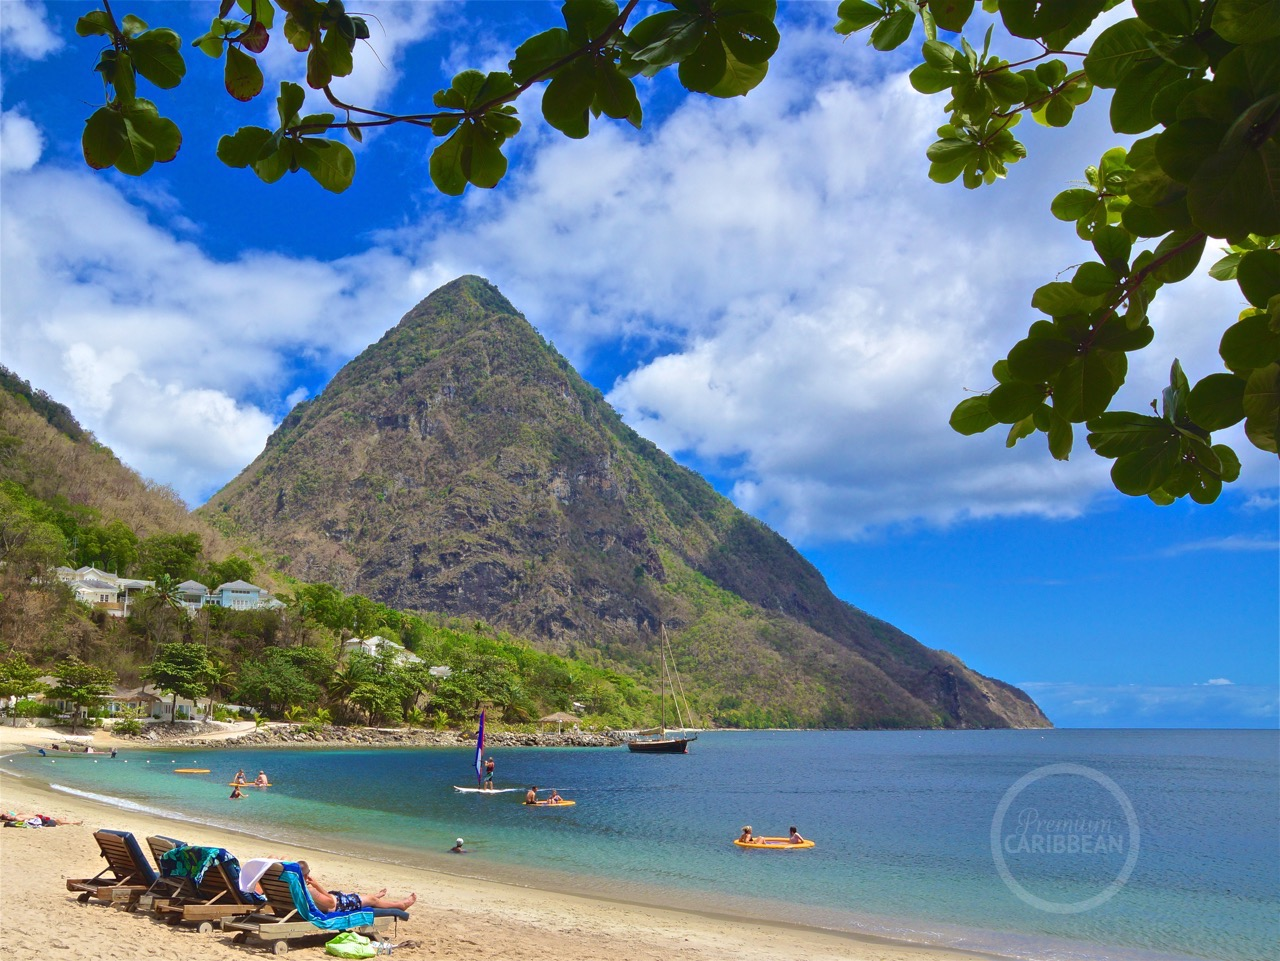 Petit Piton St. Lucia